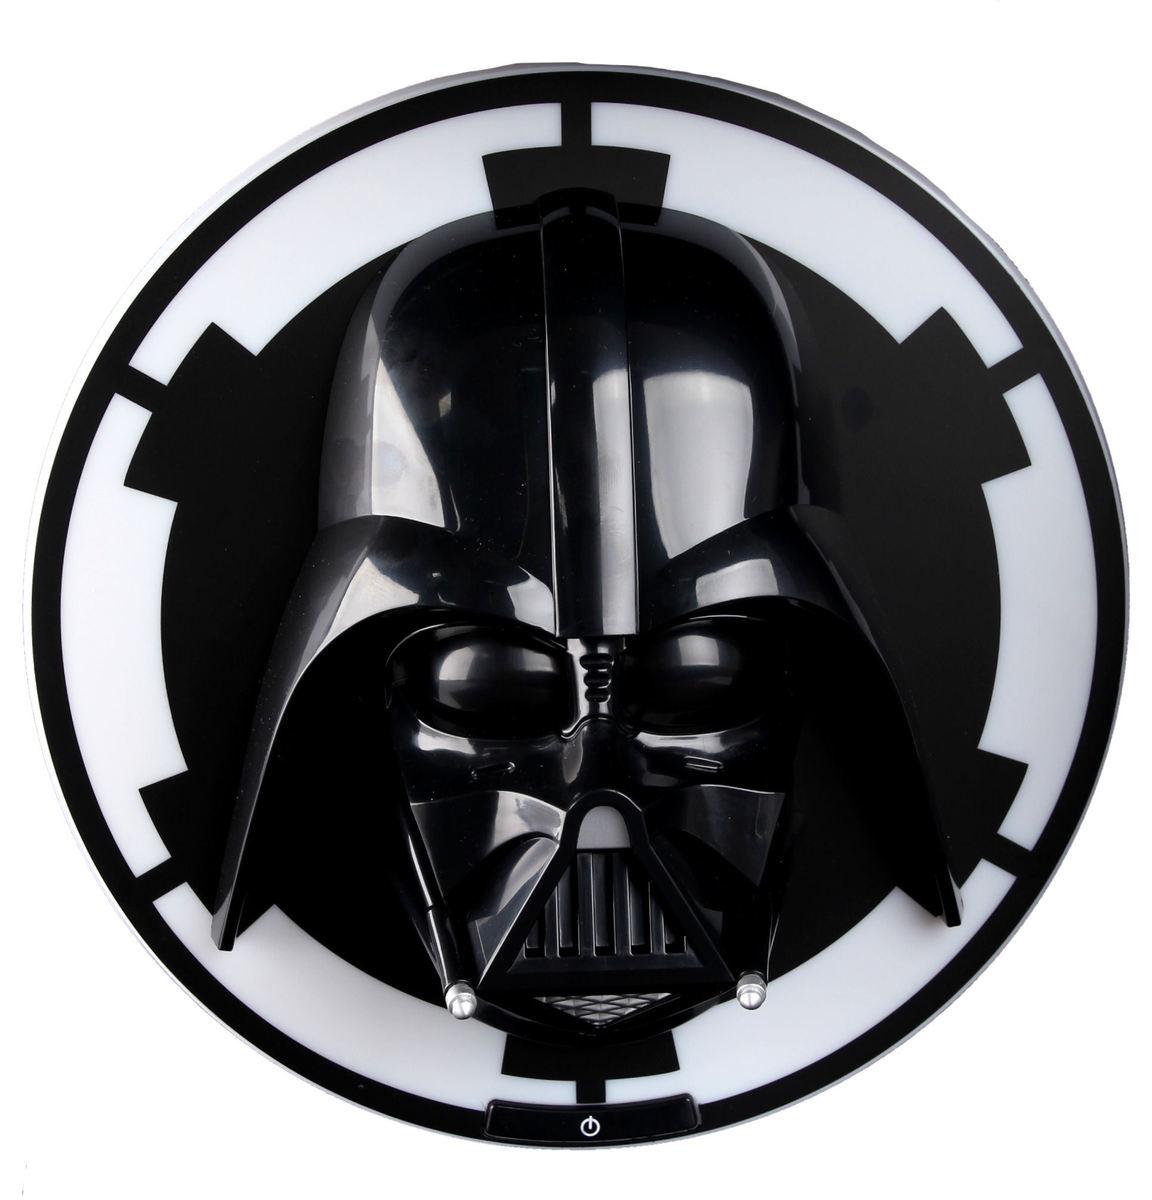 nástěnná lampa Star Wars - Darth Vader - BLK - 3DLP16003GI